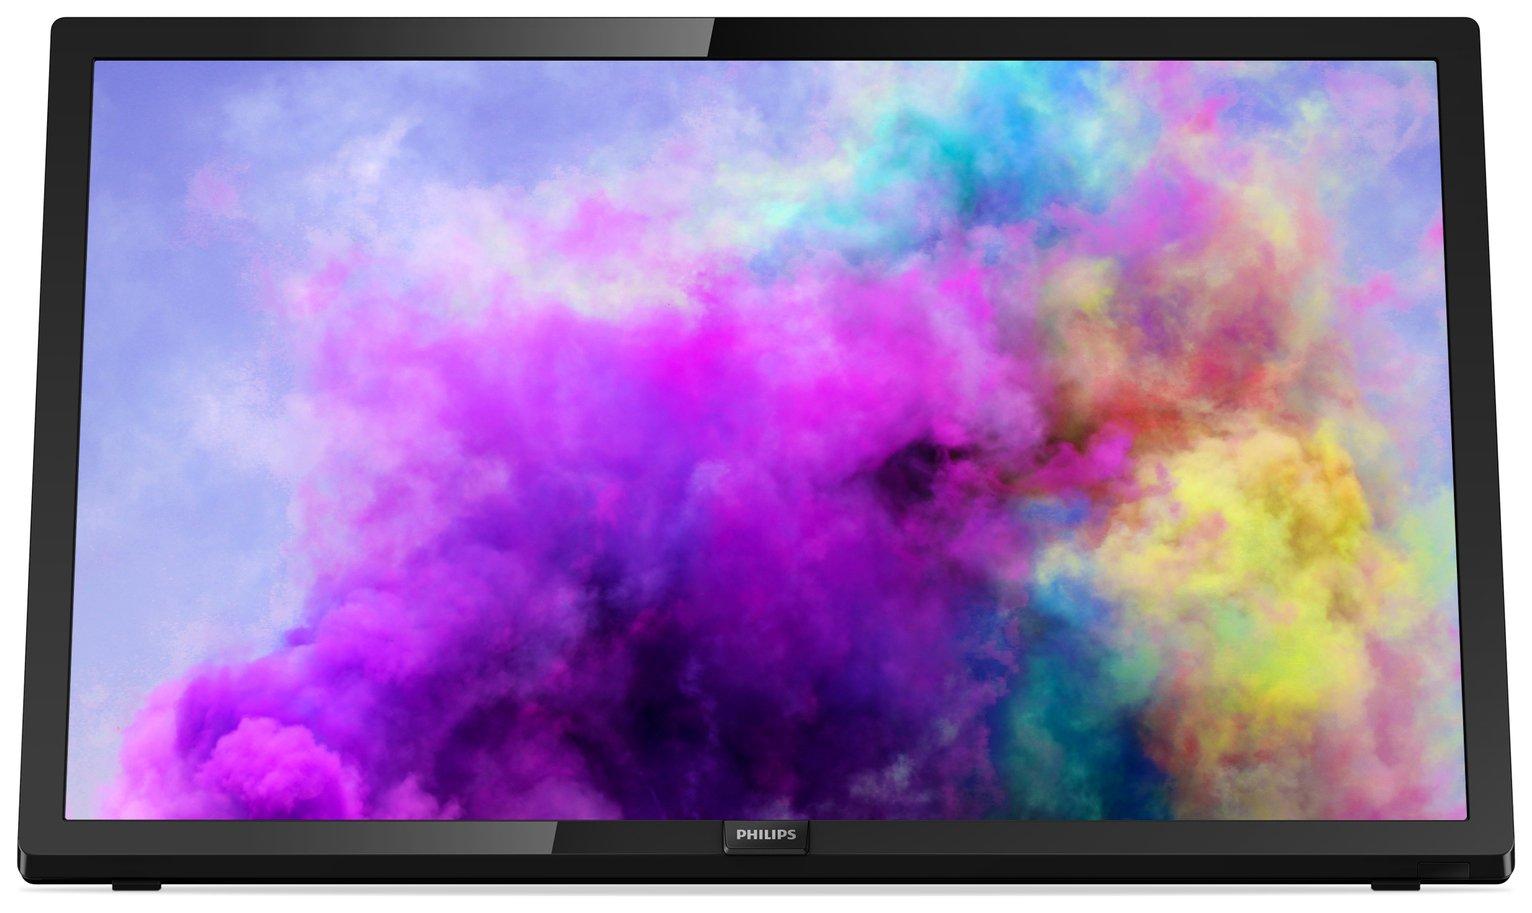 Philips 24 Inch 24PFT5303 Full HD TV